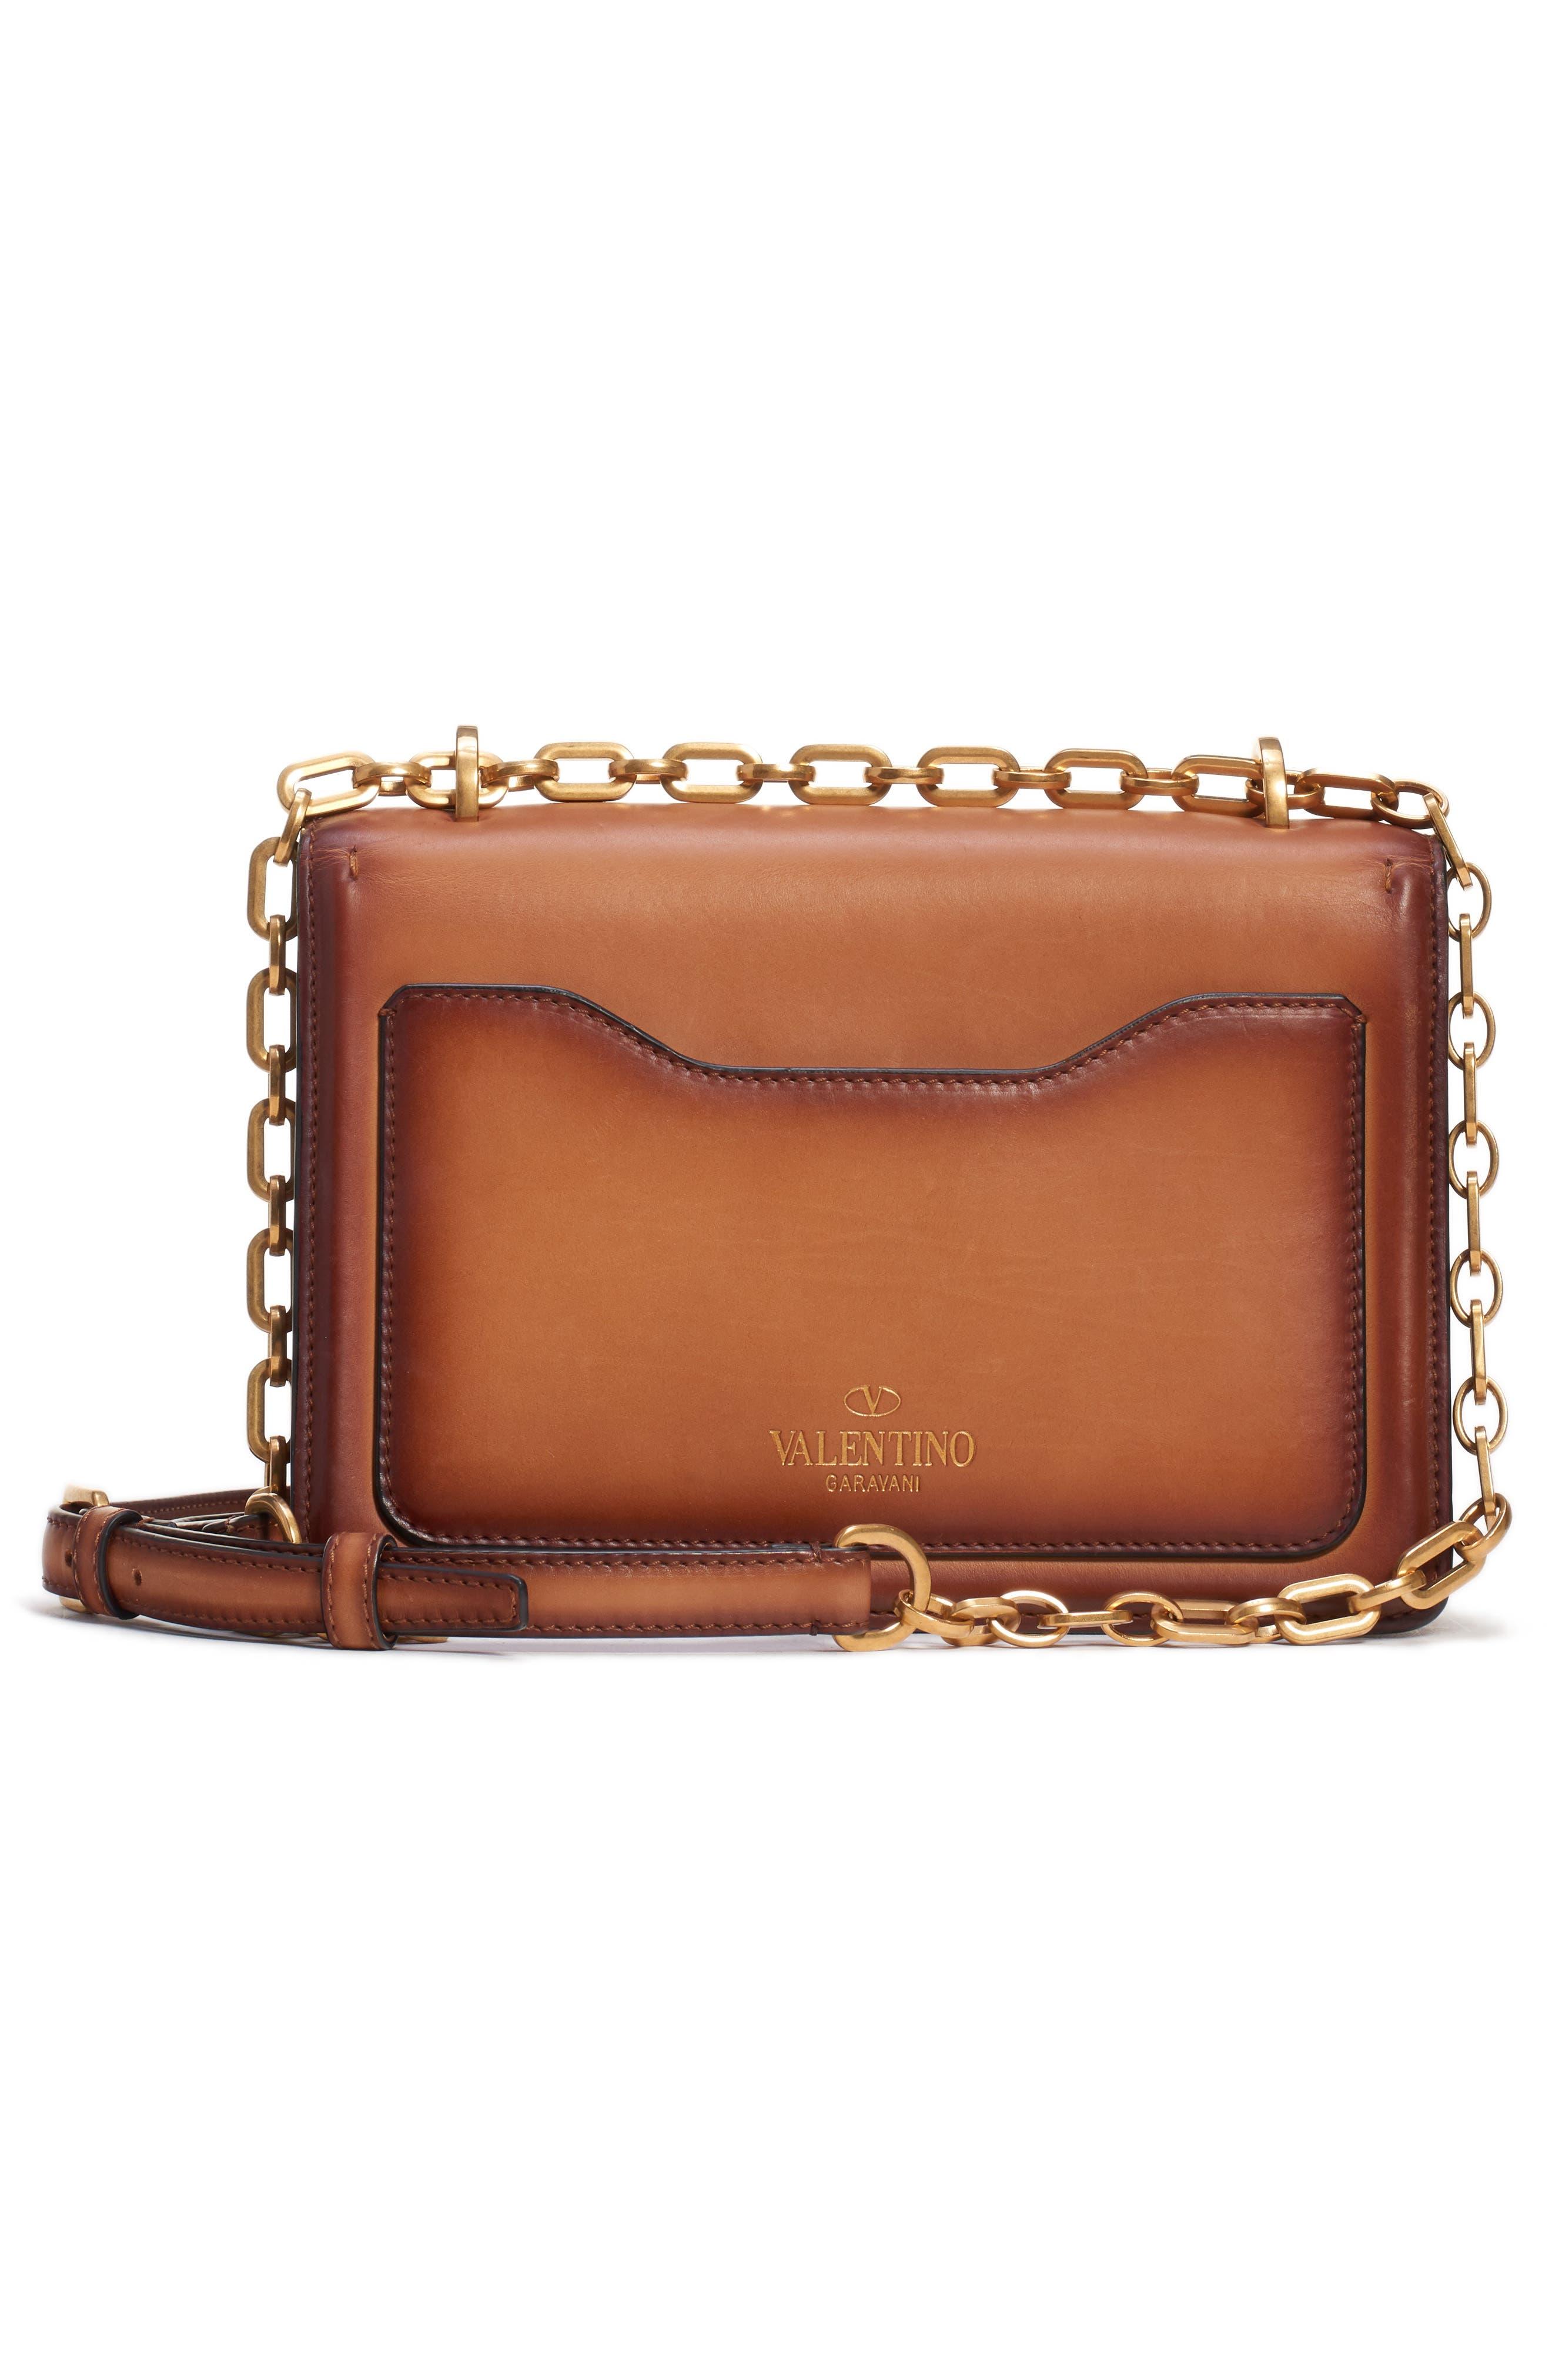 VALENTINO GARAVANI,                             Small Uptown Leather Shoulder Bag,                             Alternate thumbnail 2, color,                             BRIGHT COGNAC